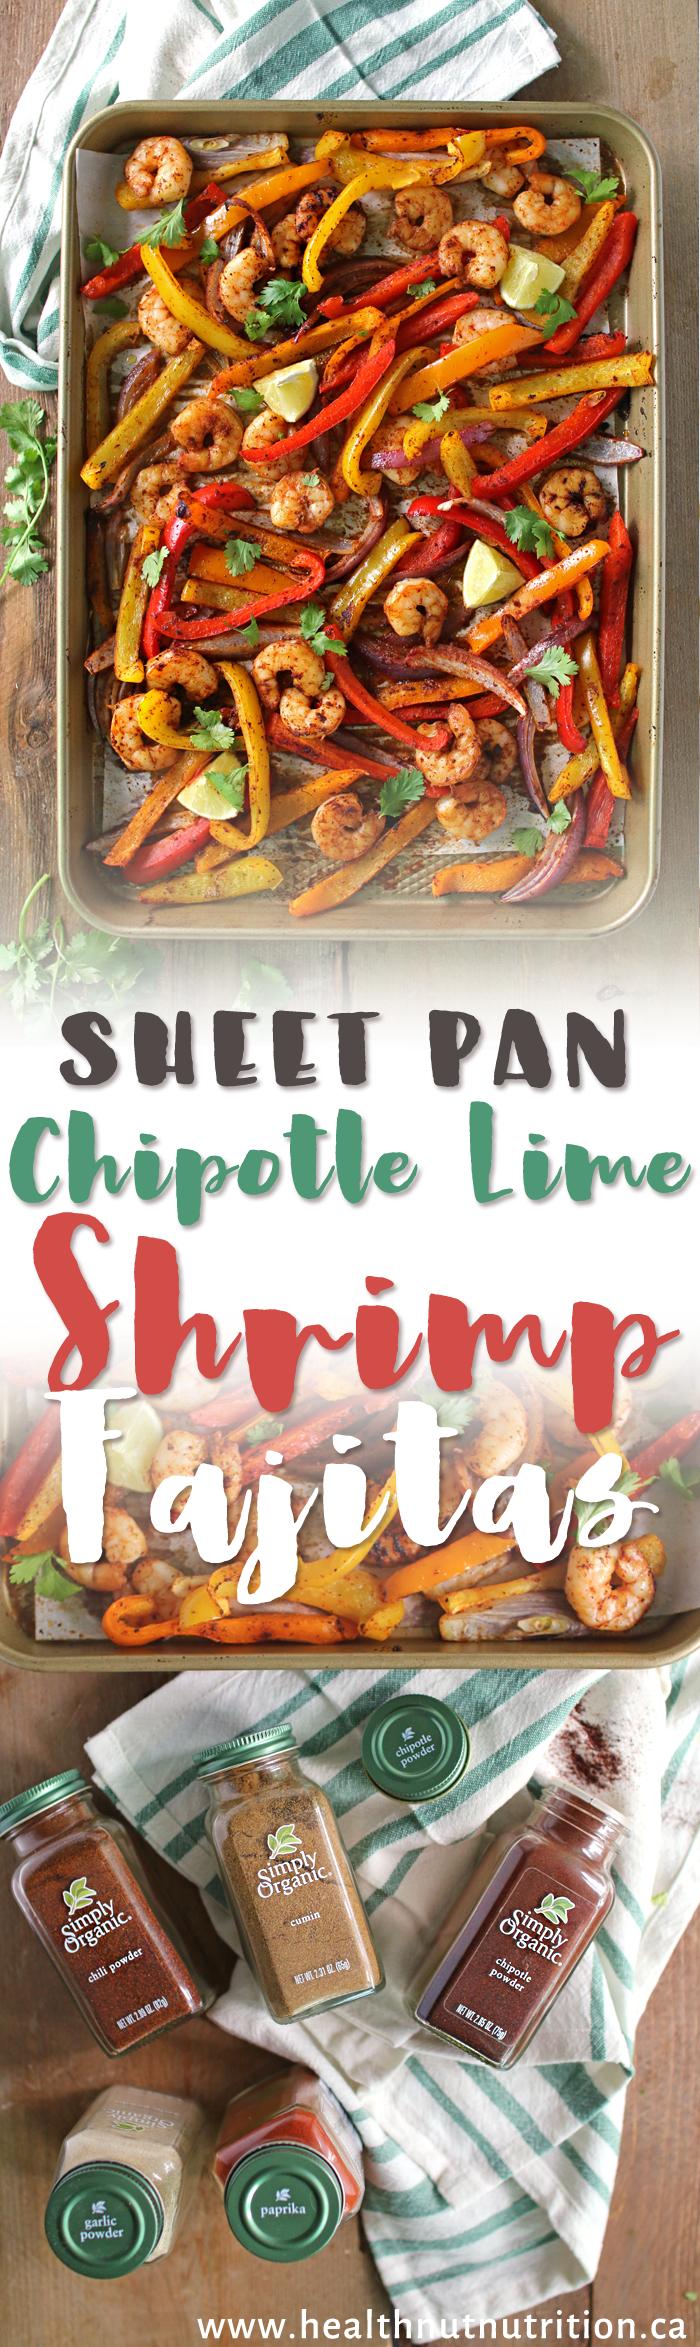 30 Min Easy Shrimp Fajitas! #ad @simplyorganicfoods